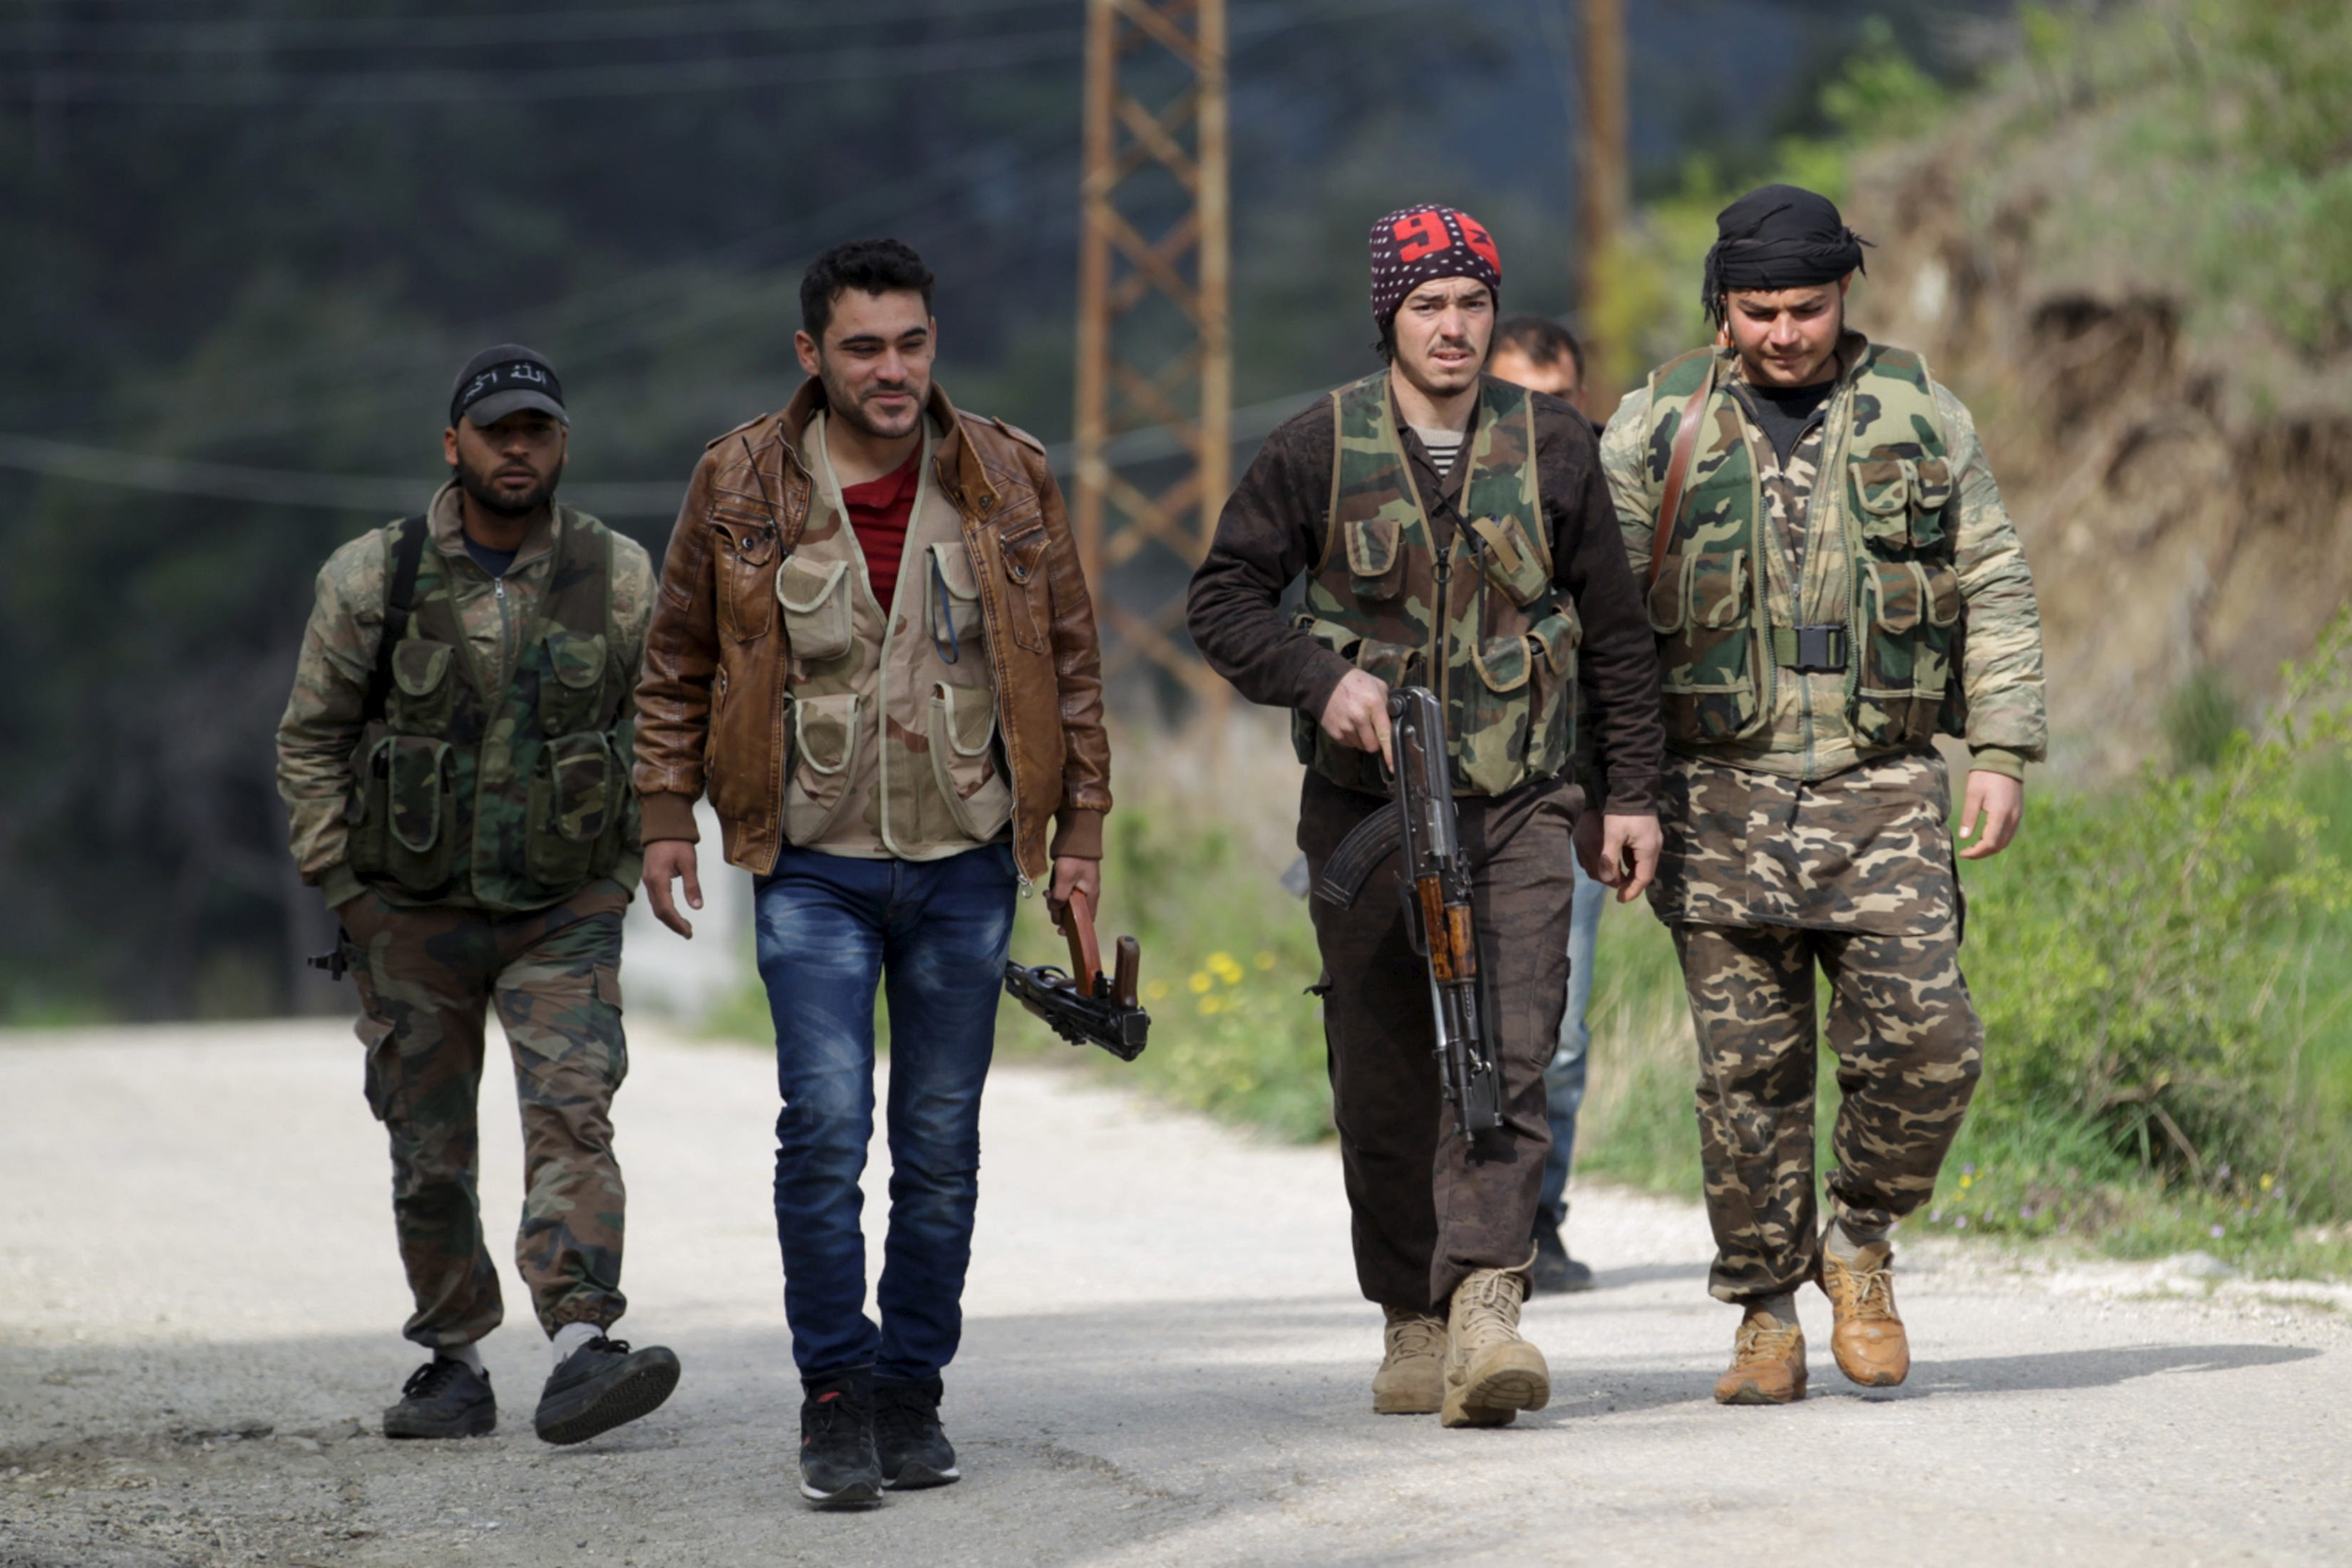 turkmen rebels syria